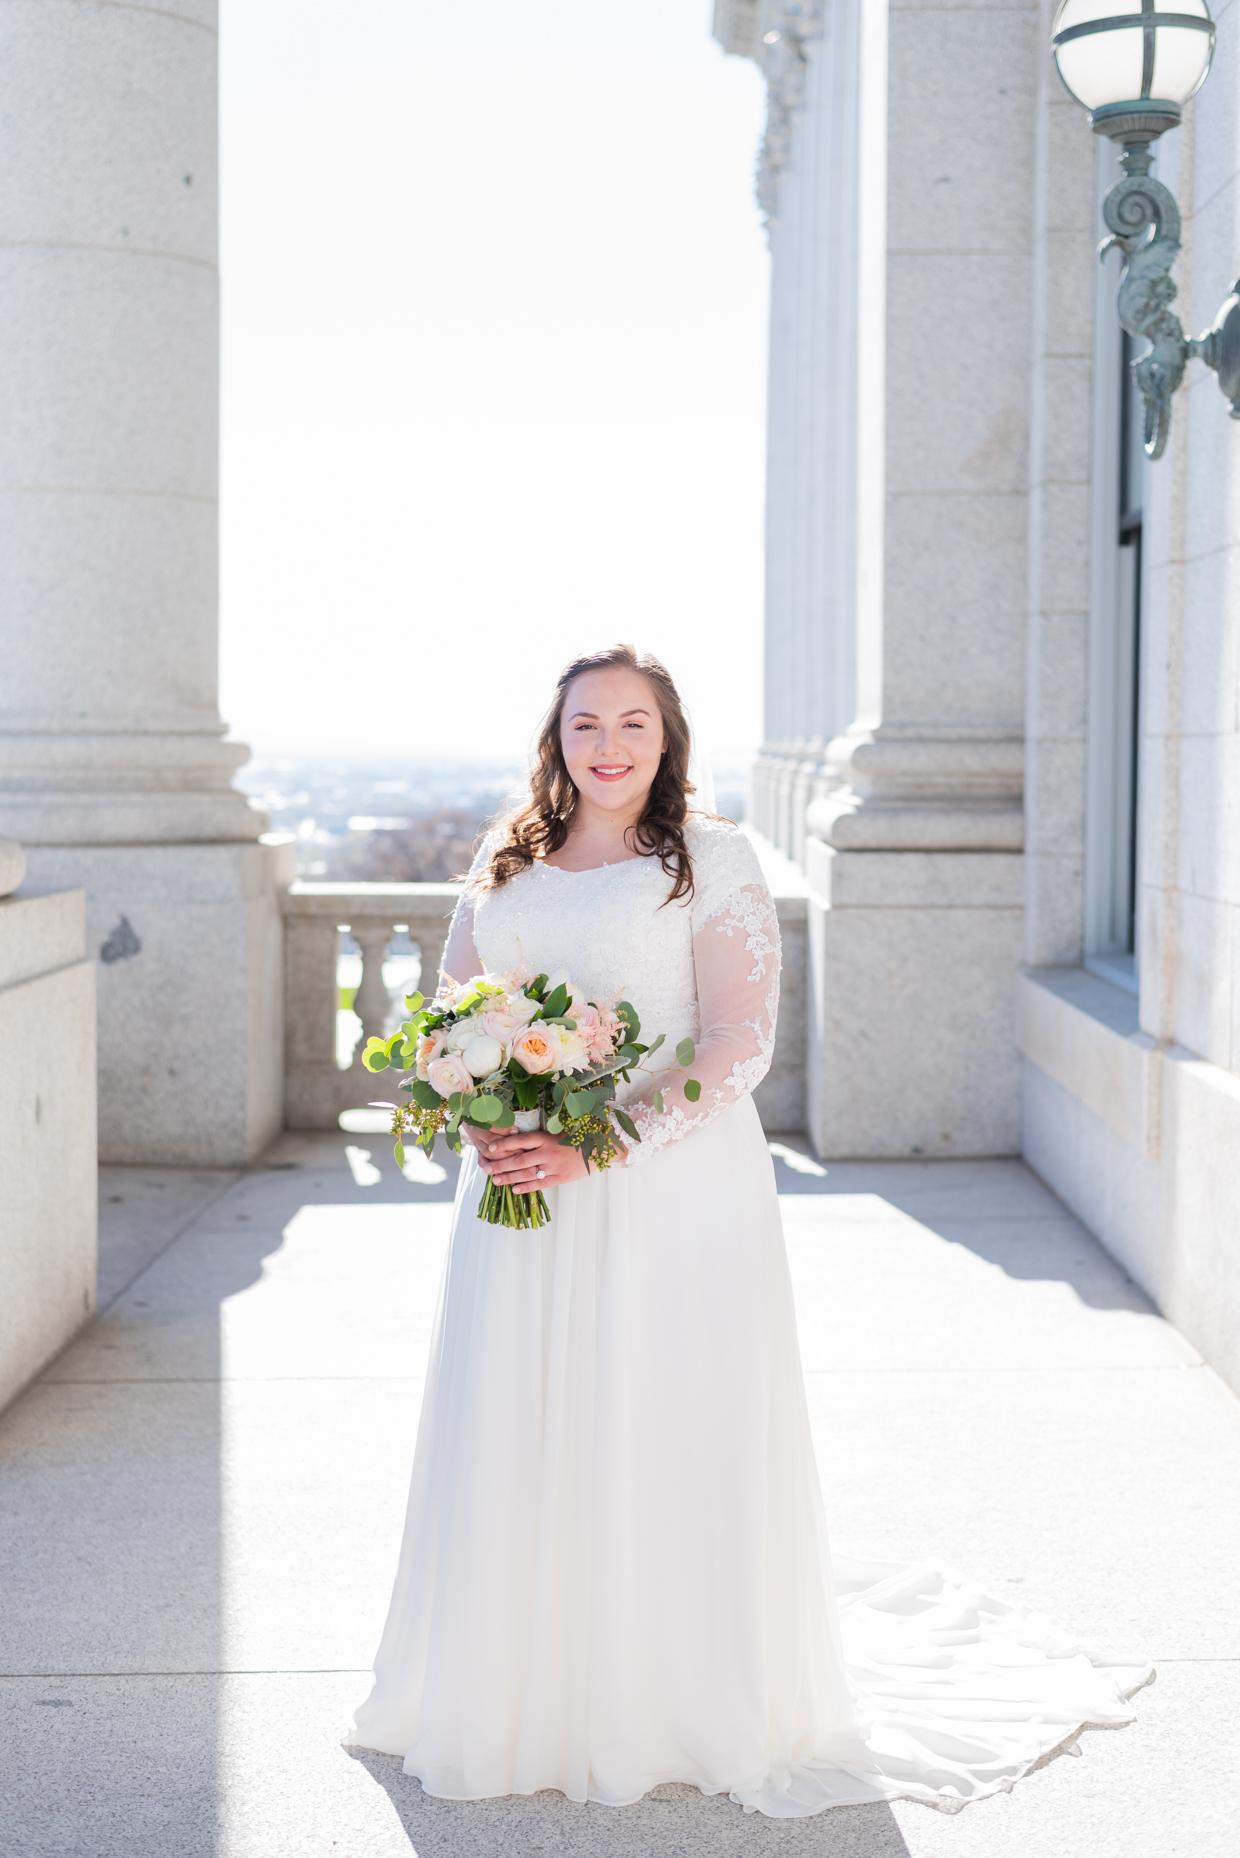 bailey.dayel bridals-4.jpg